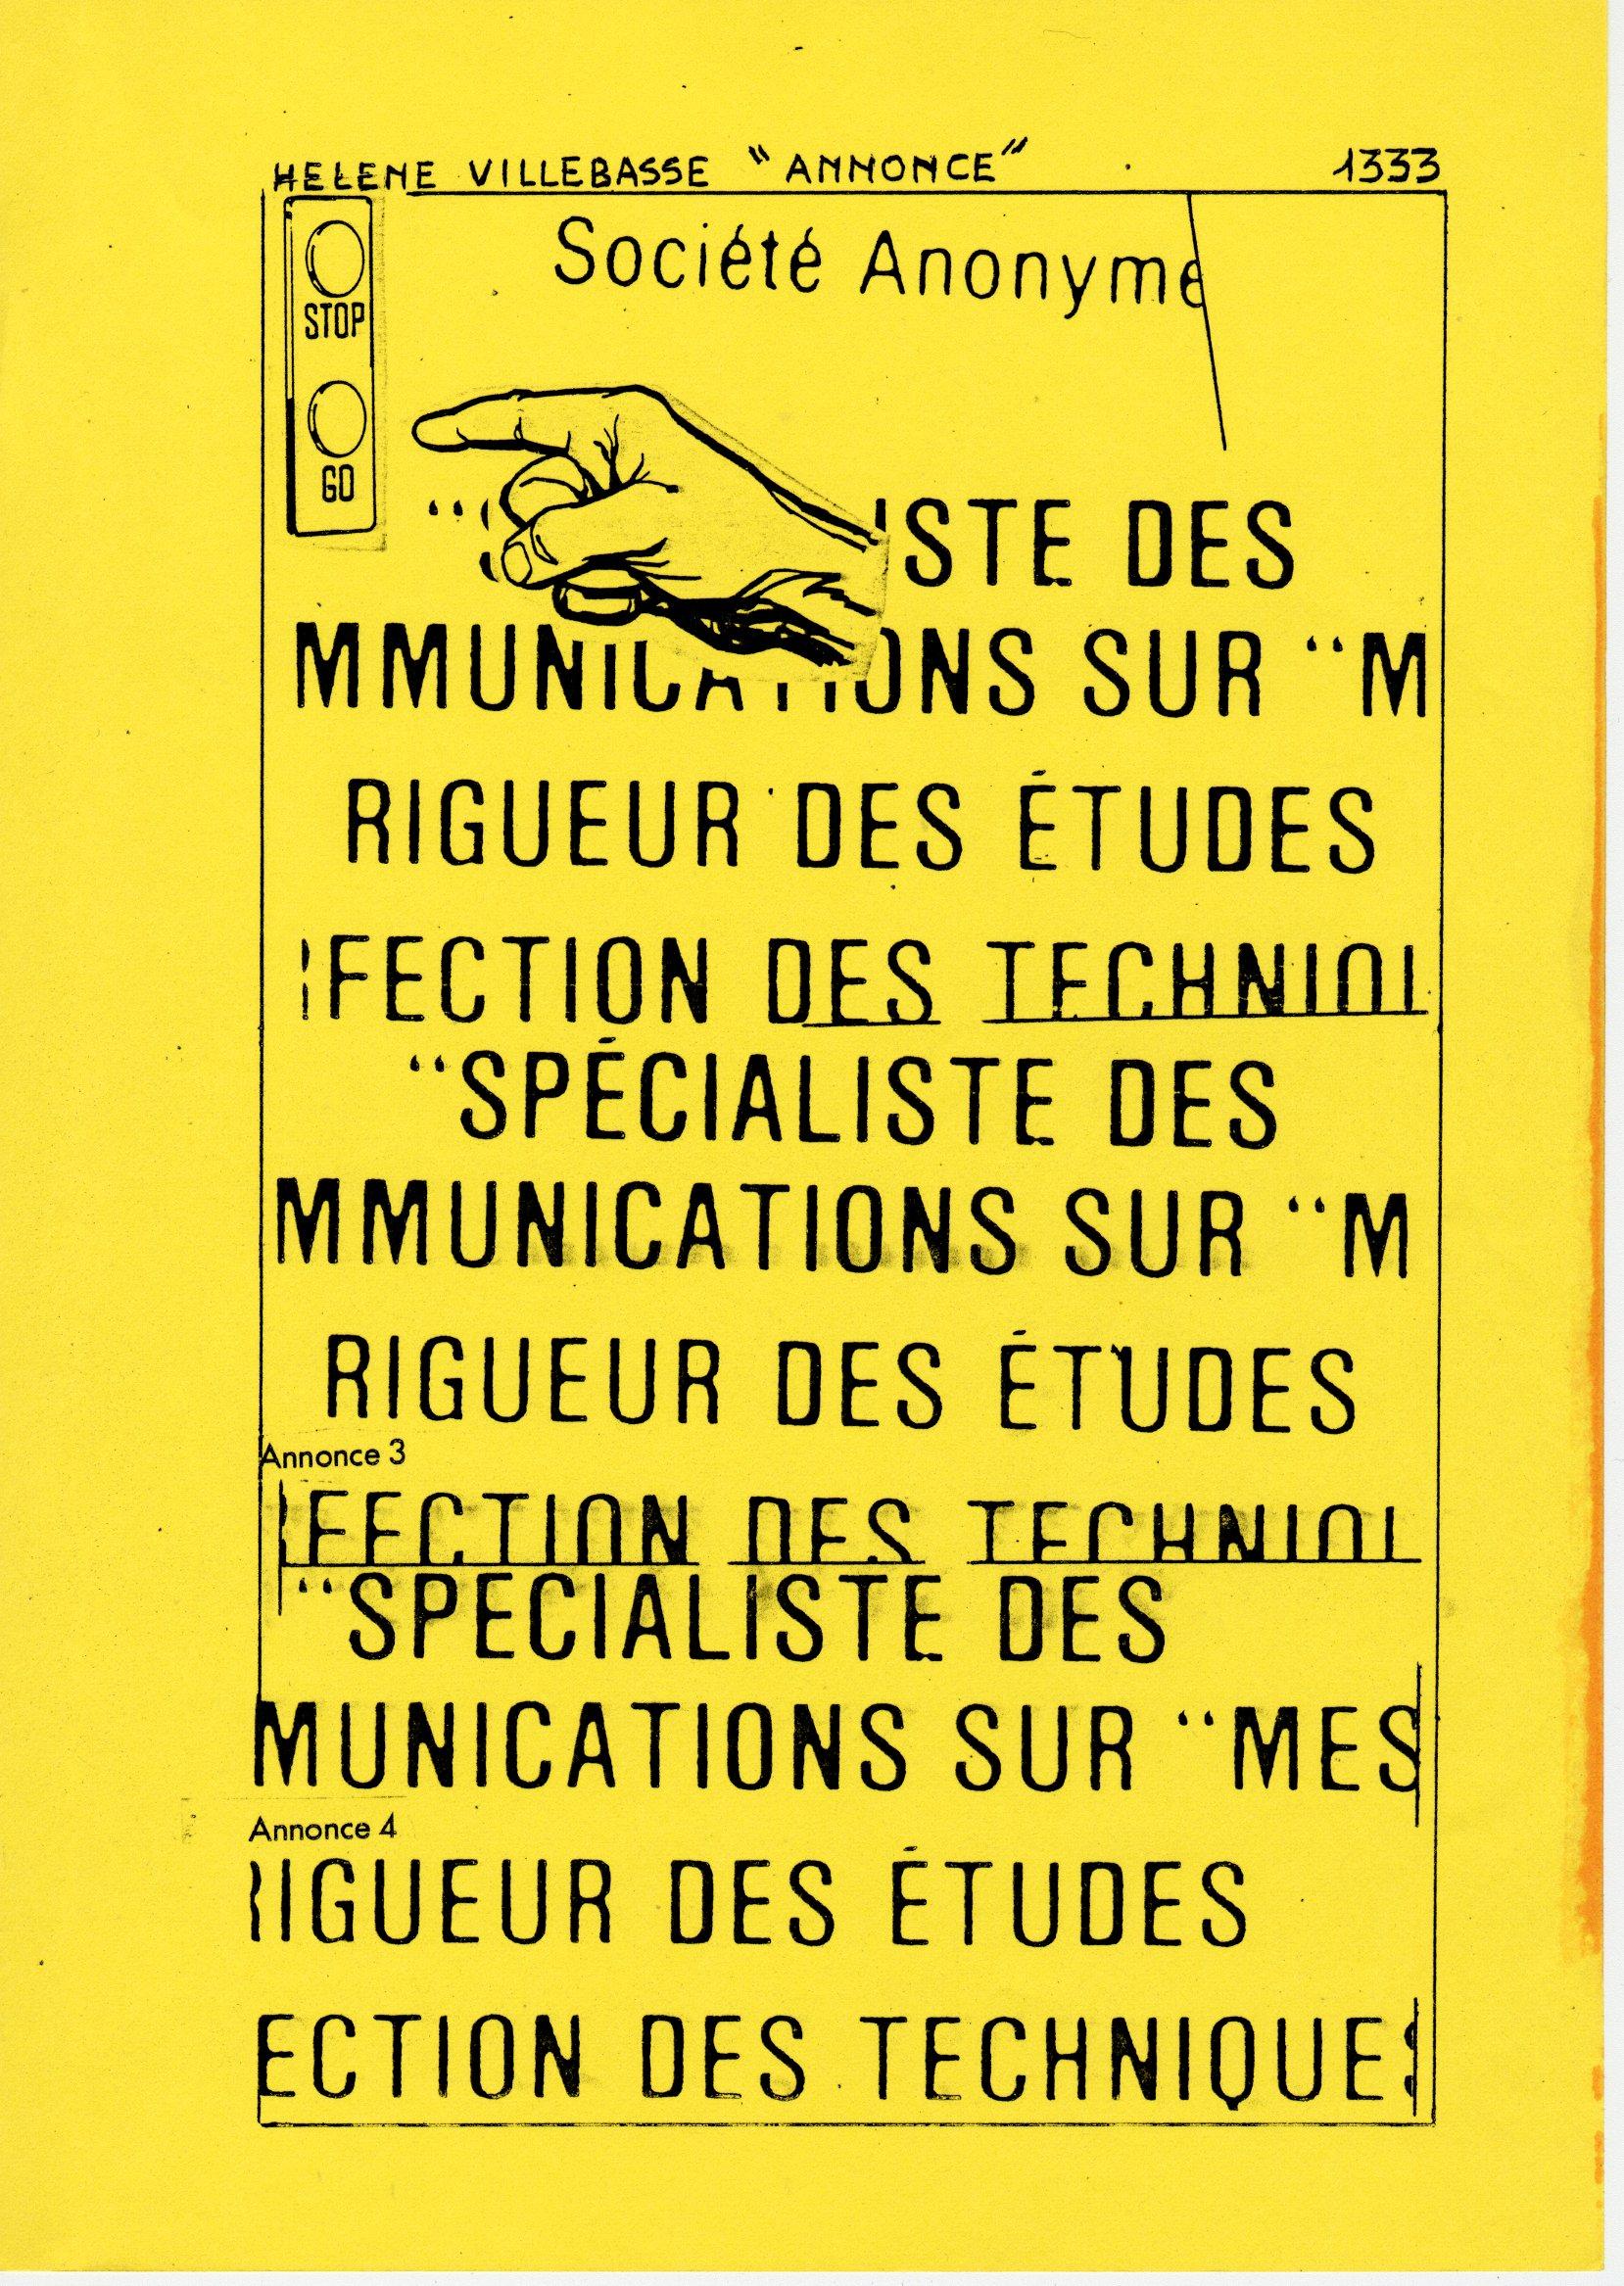 page 1333 H. Villebasse ANNONCE